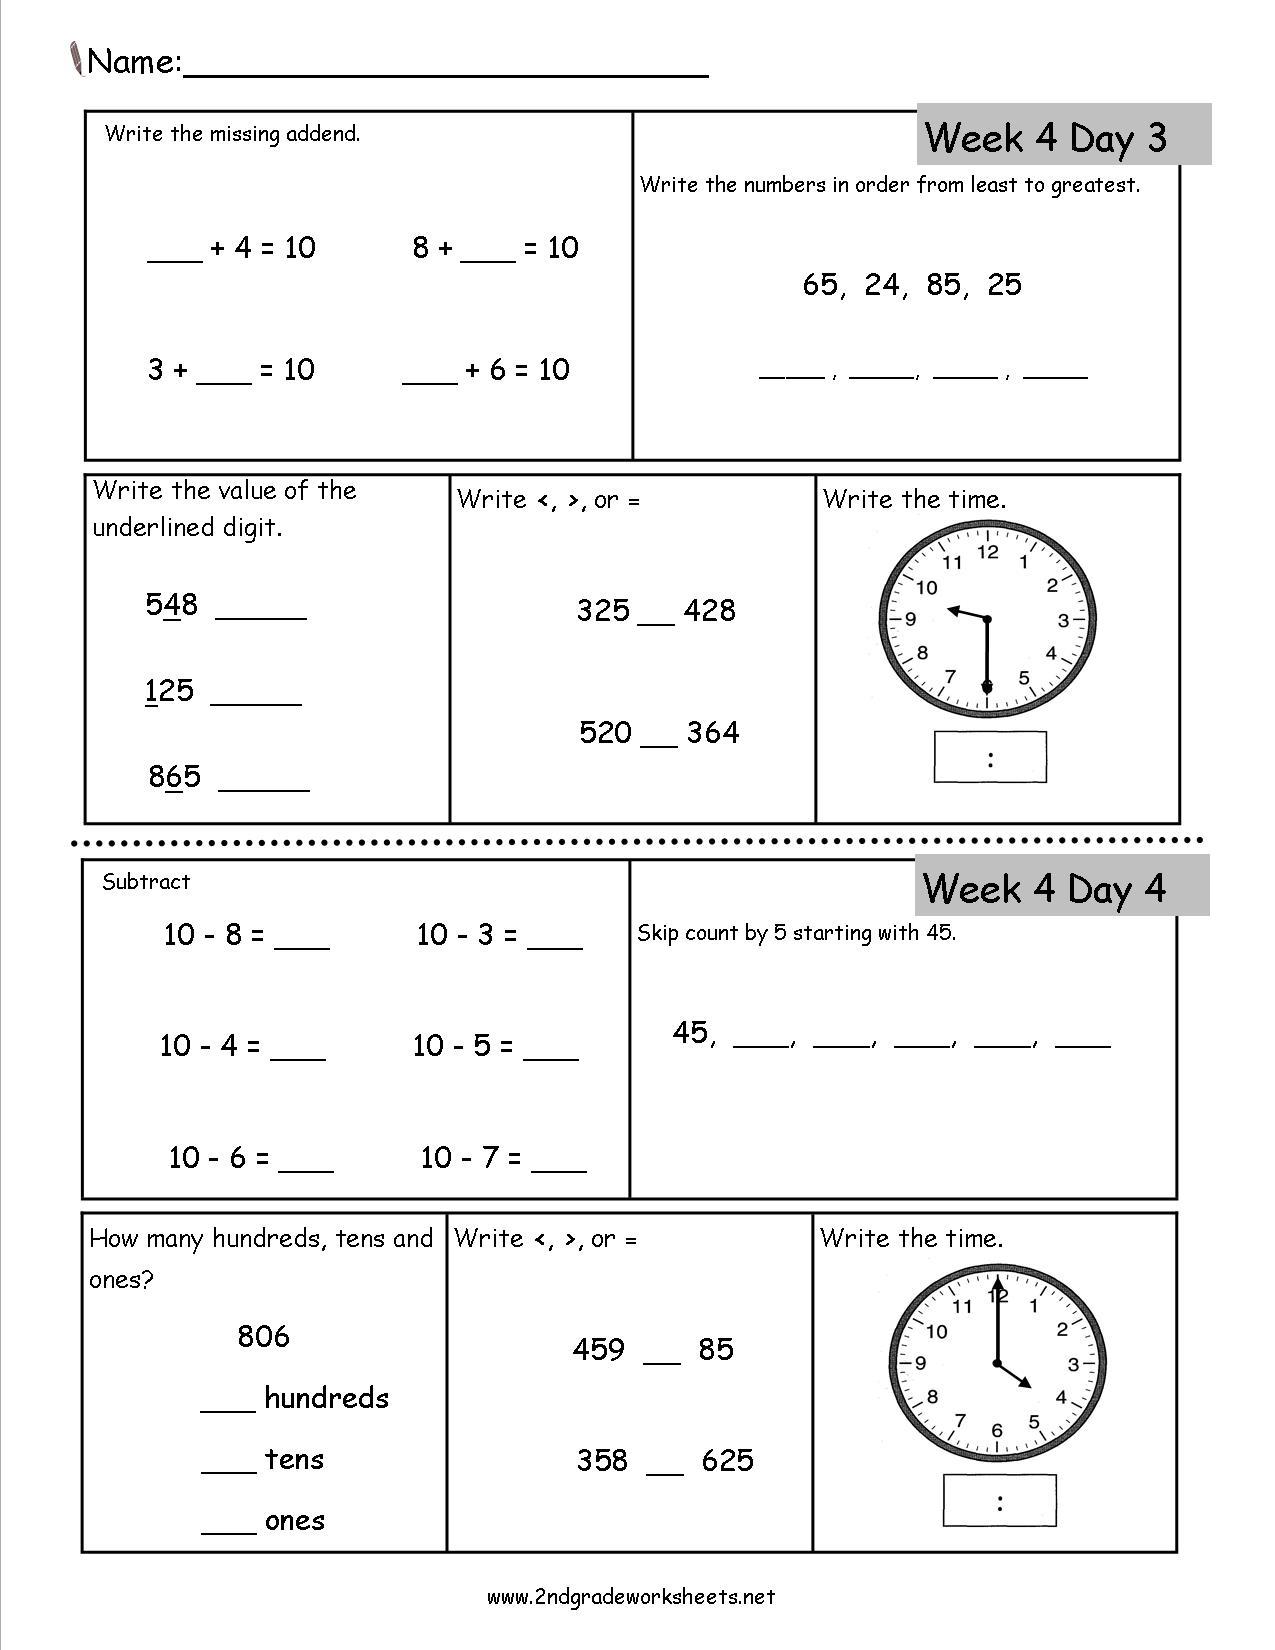 2Nd Grade Daily Math Worksheets